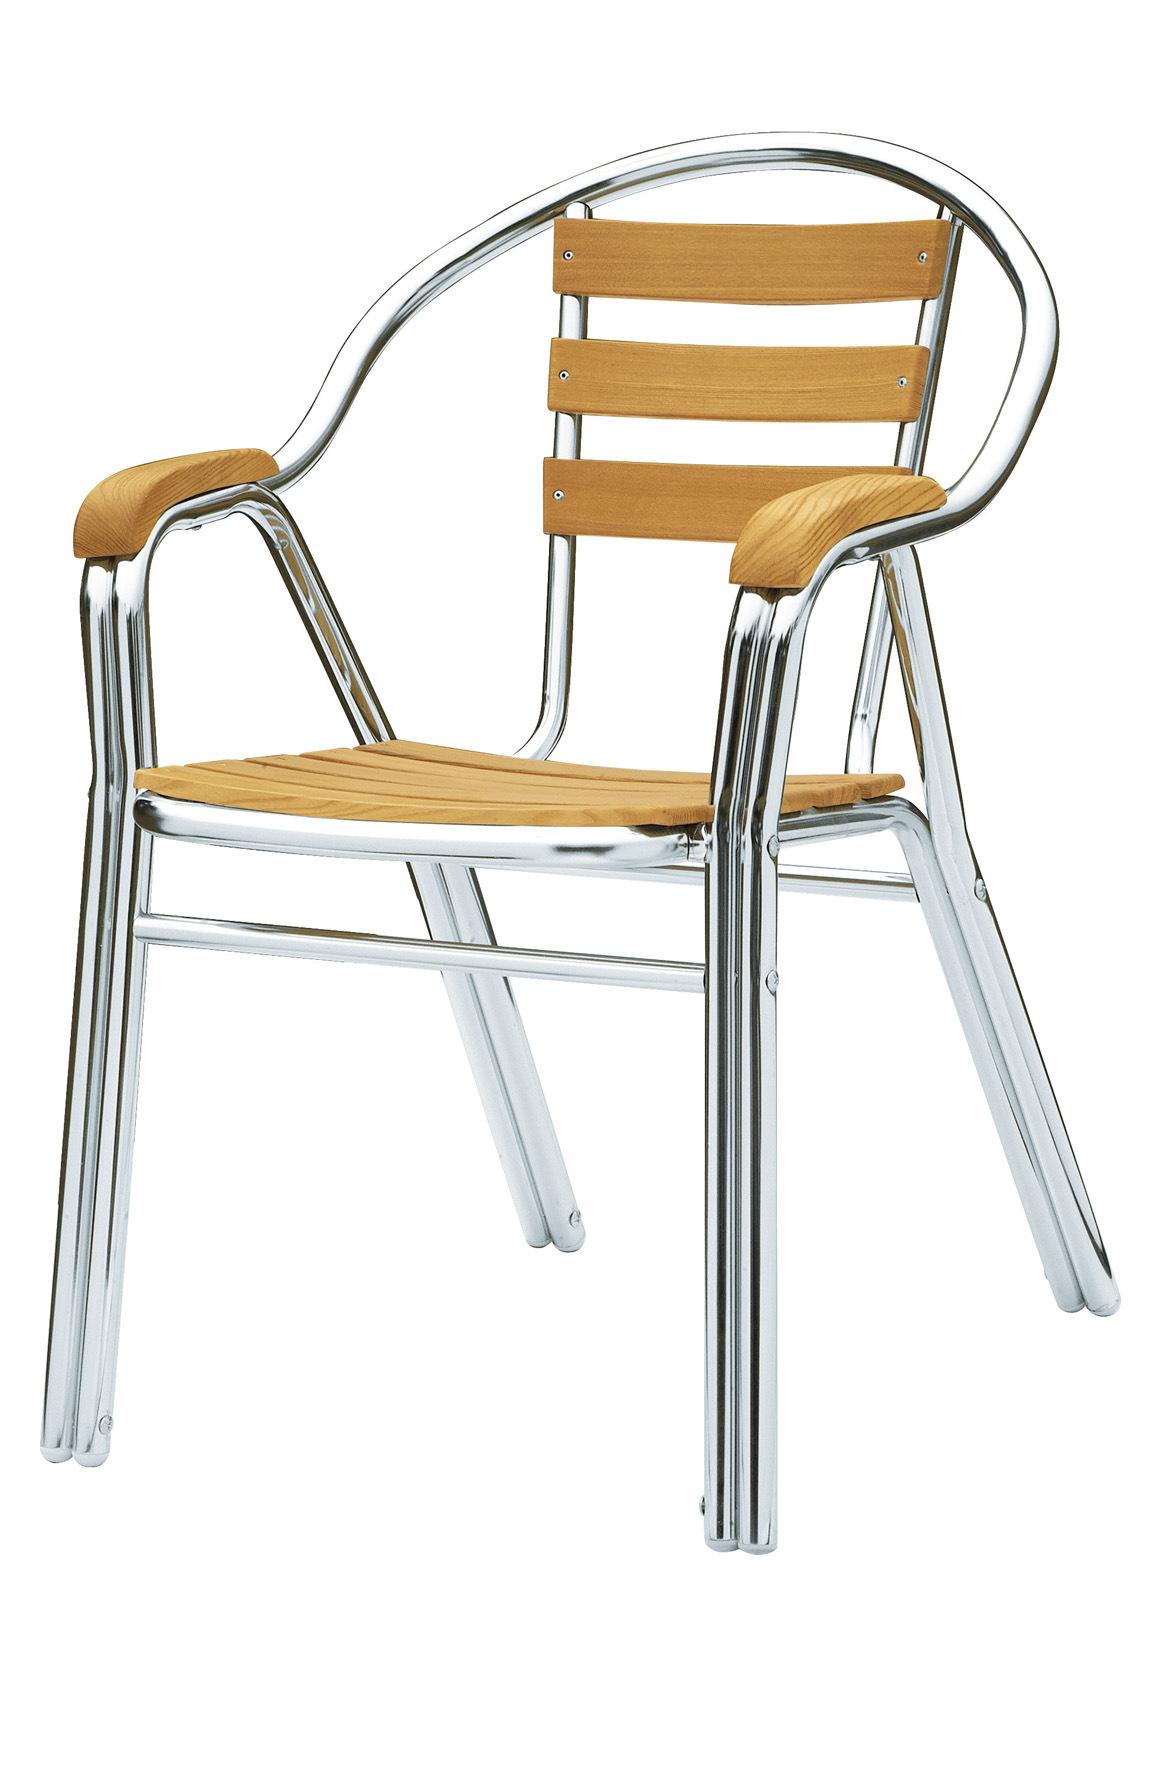 Silla de jard n de aluminio sv 2025 silla de jard n de - Sillas de jardin de aluminio ...